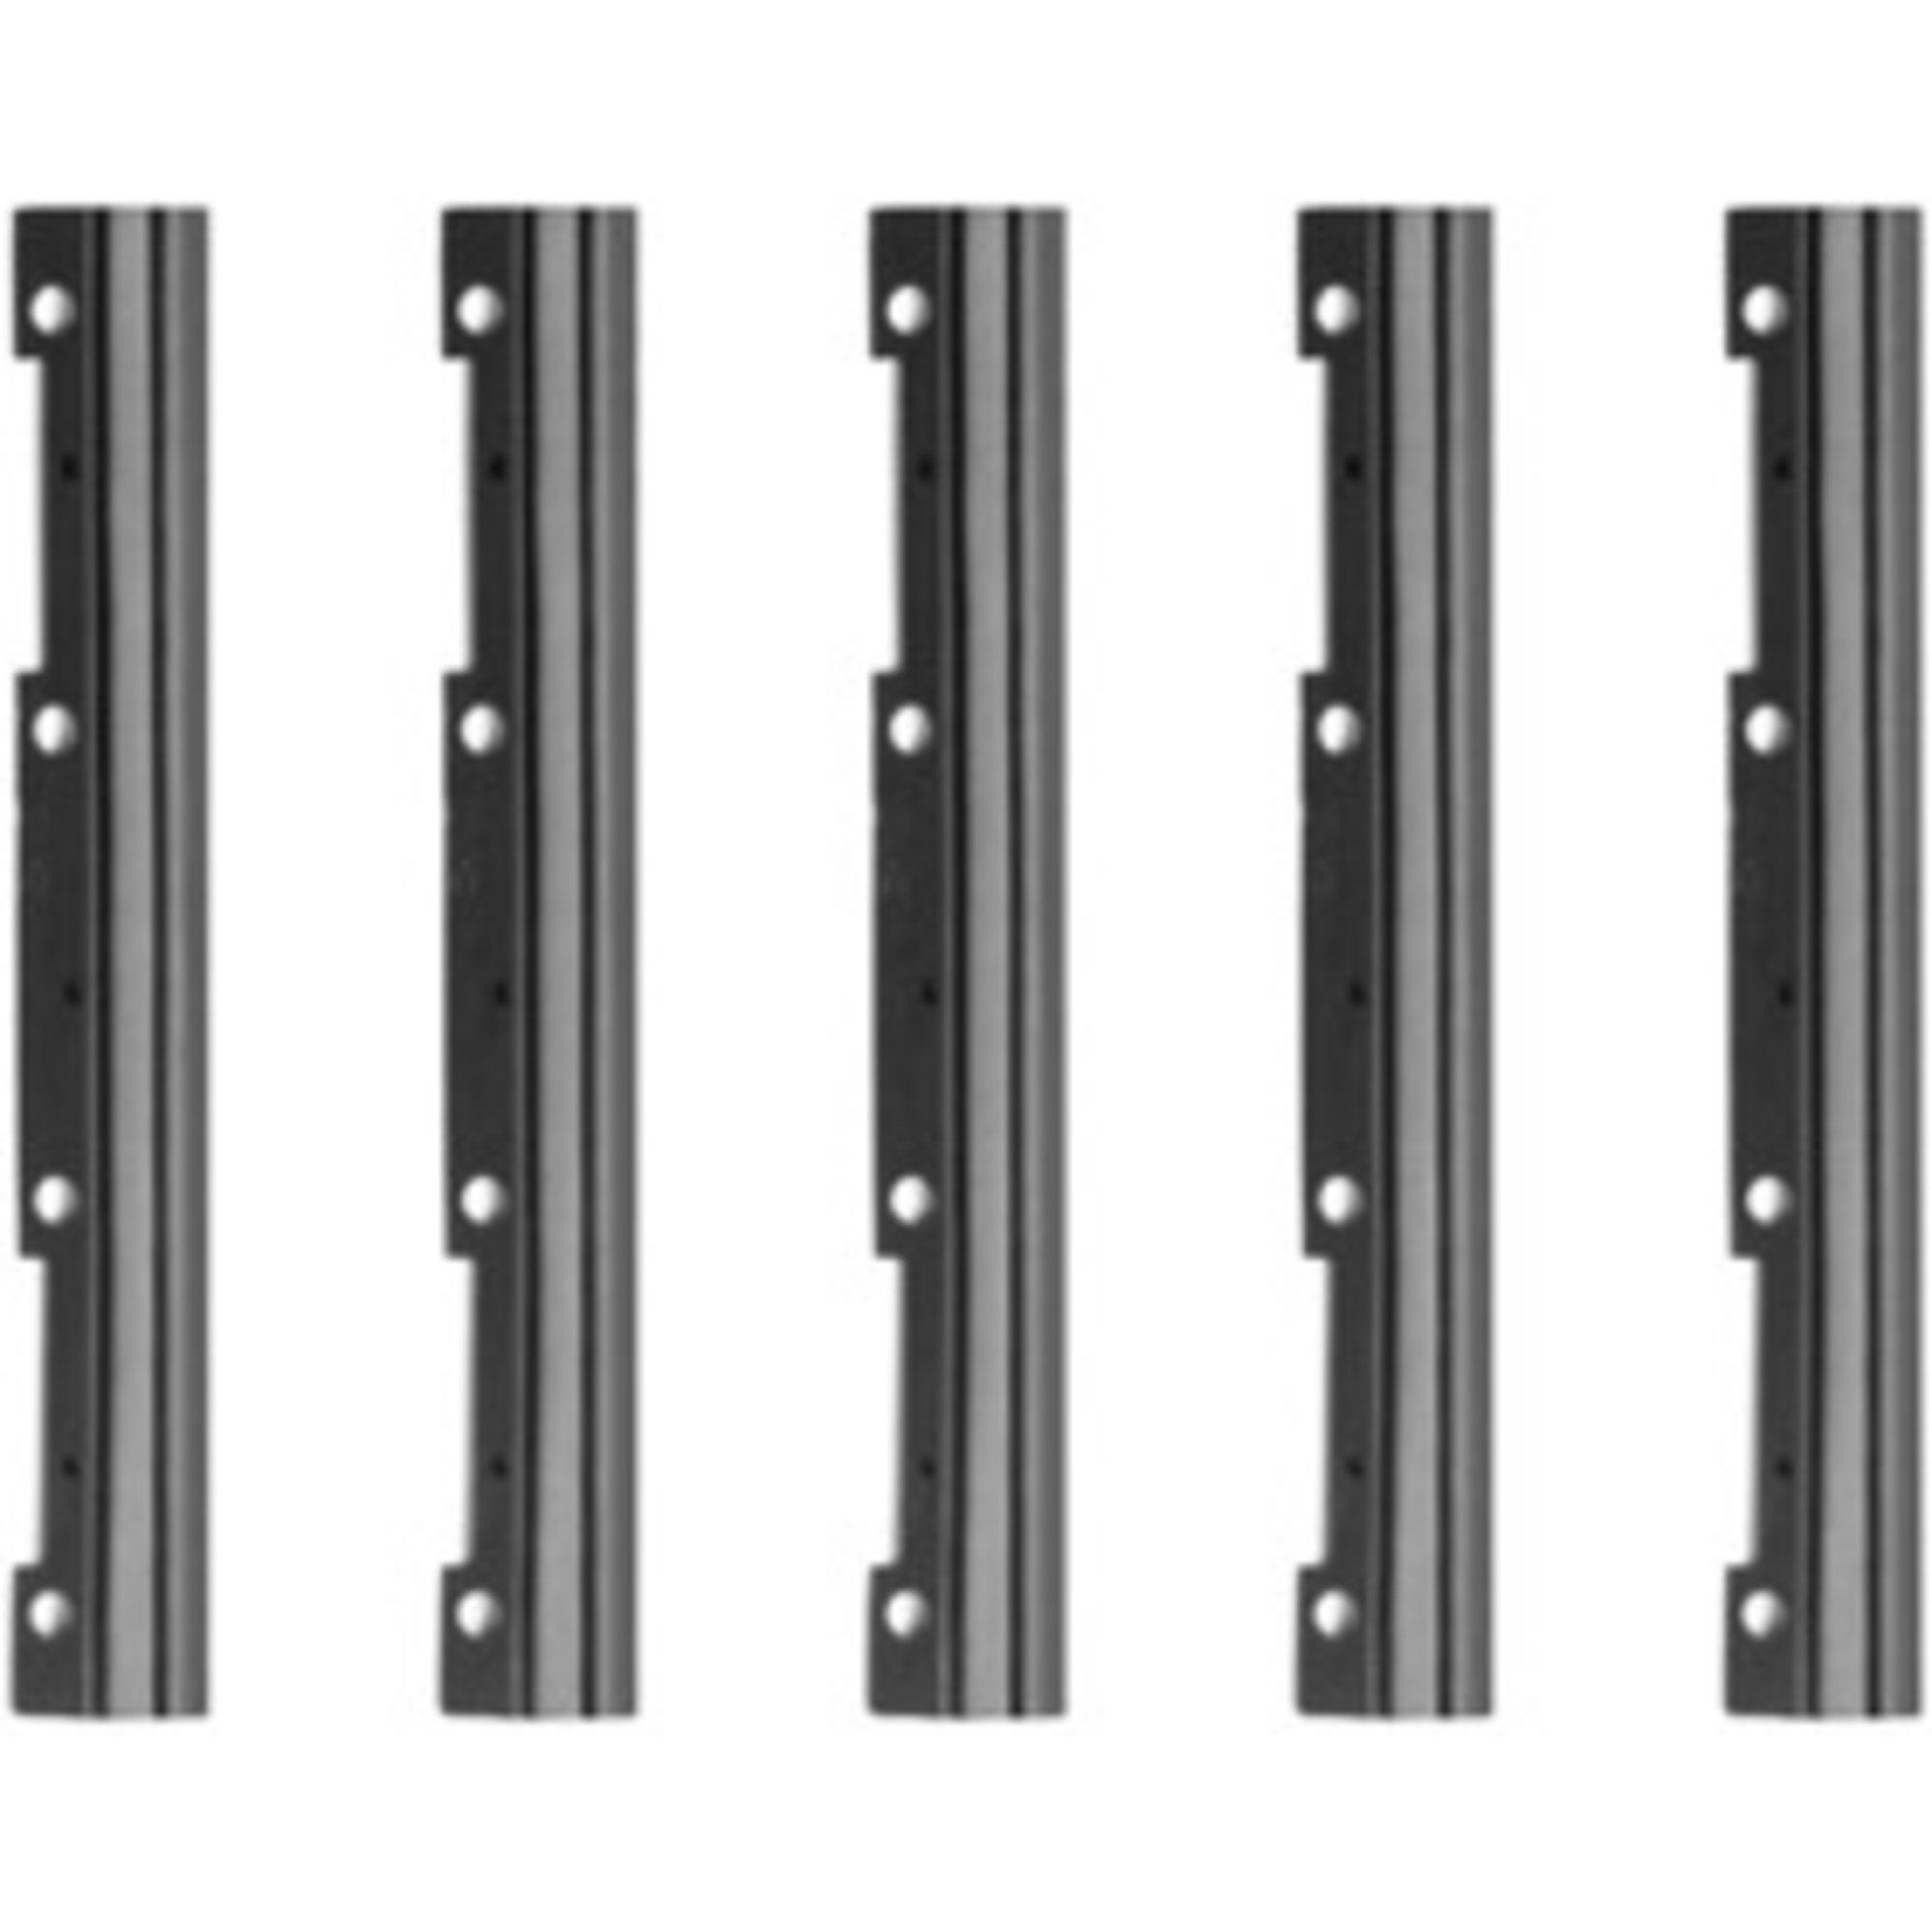 Eufy RoboVac underhåll gummistrips 11S/15C/30C/35C